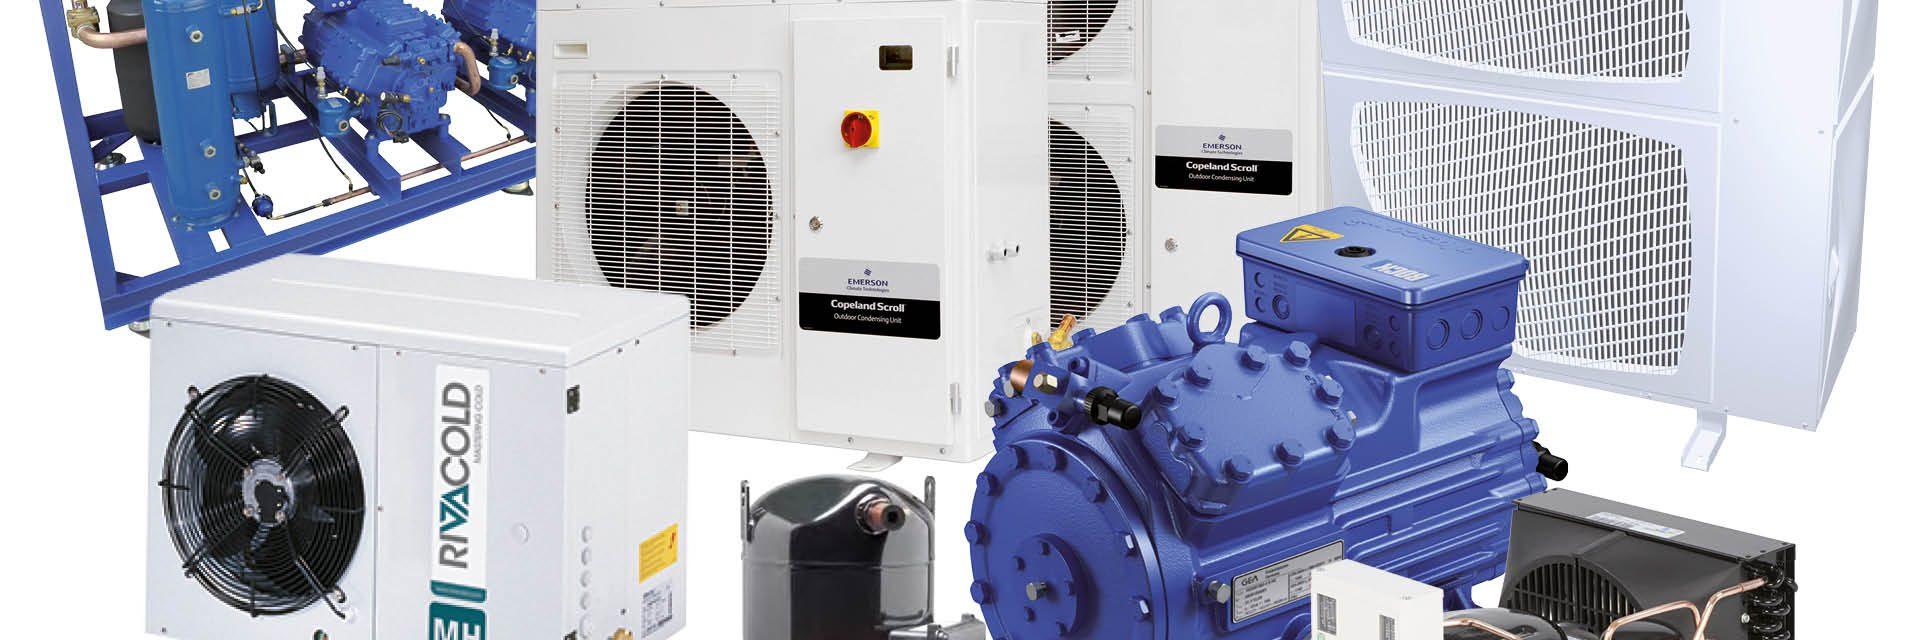 Compressoren, condensing units en unitbouw van Frigro - Gea Bock, Emerson Copeland, Panasonic, Tecumseh, Rivacold